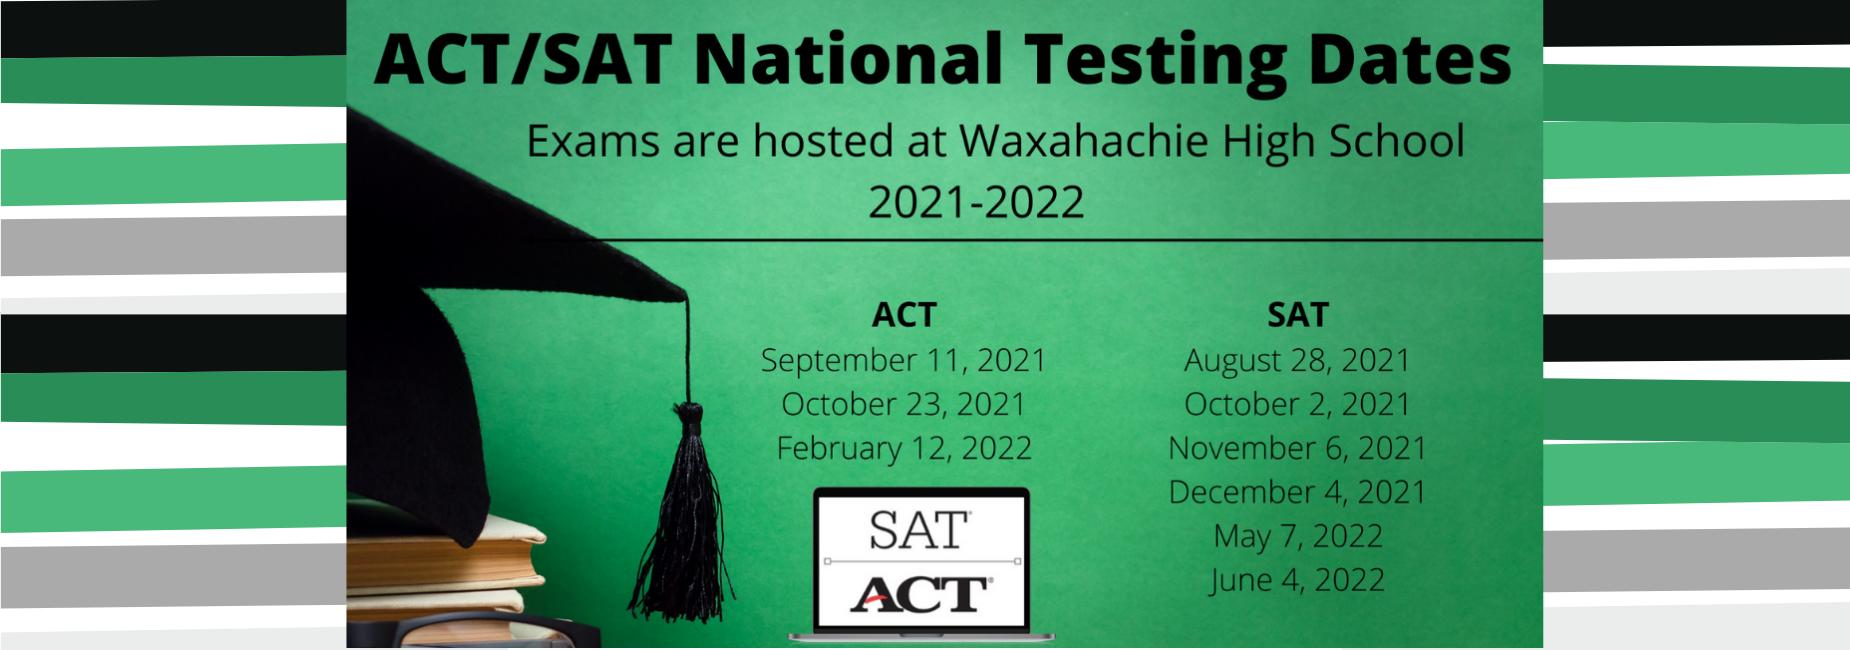 graphic describing SAT & ACT testing dates